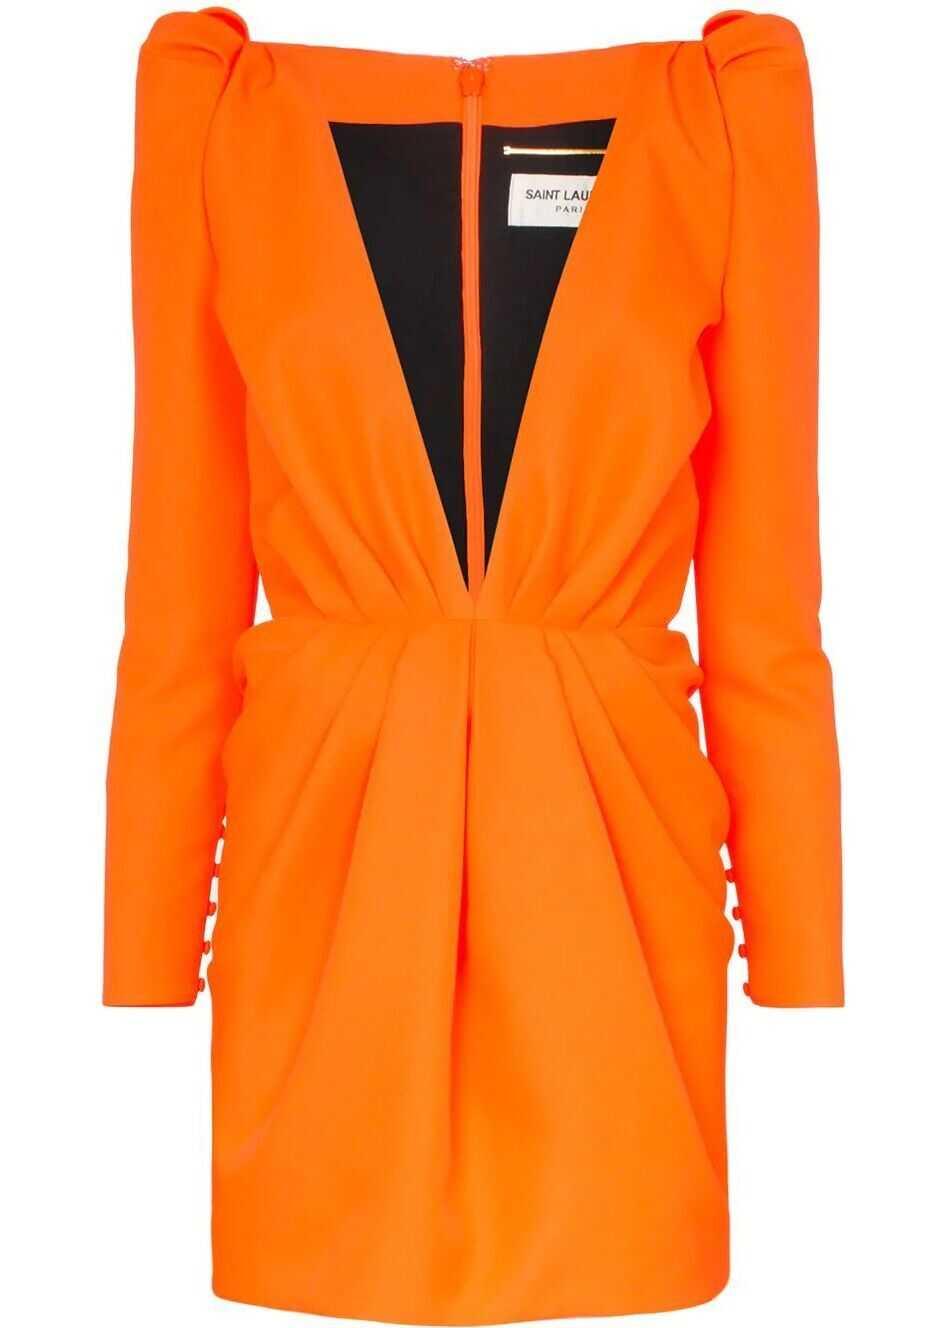 Saint Laurent Polyester Dress ORANGE